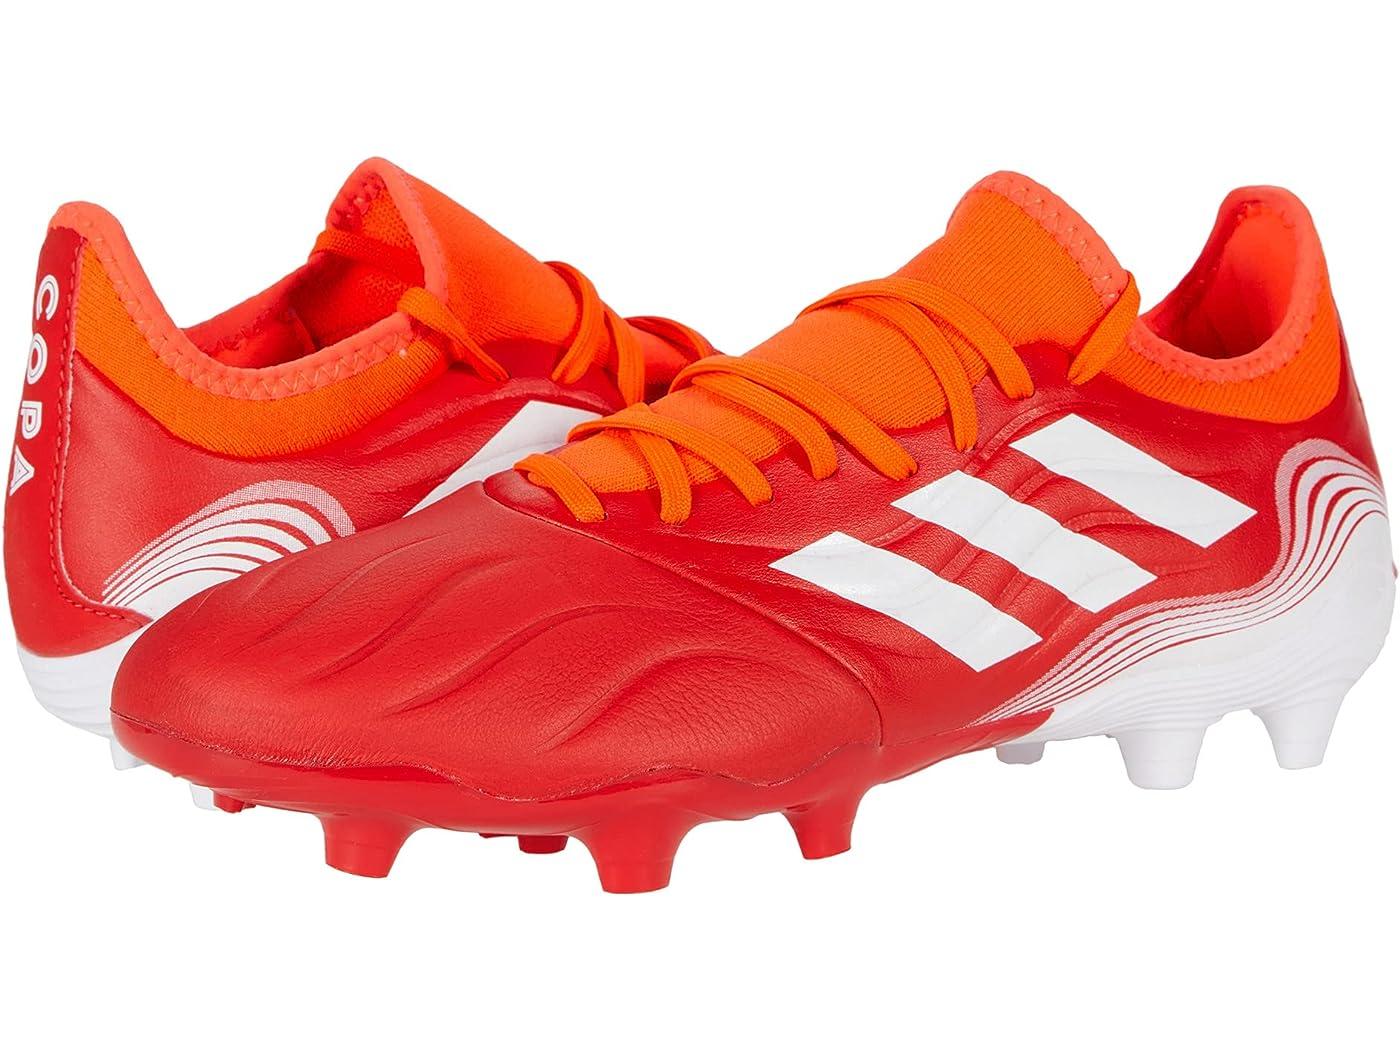 Adidas Copa Sense3 Firm Ground